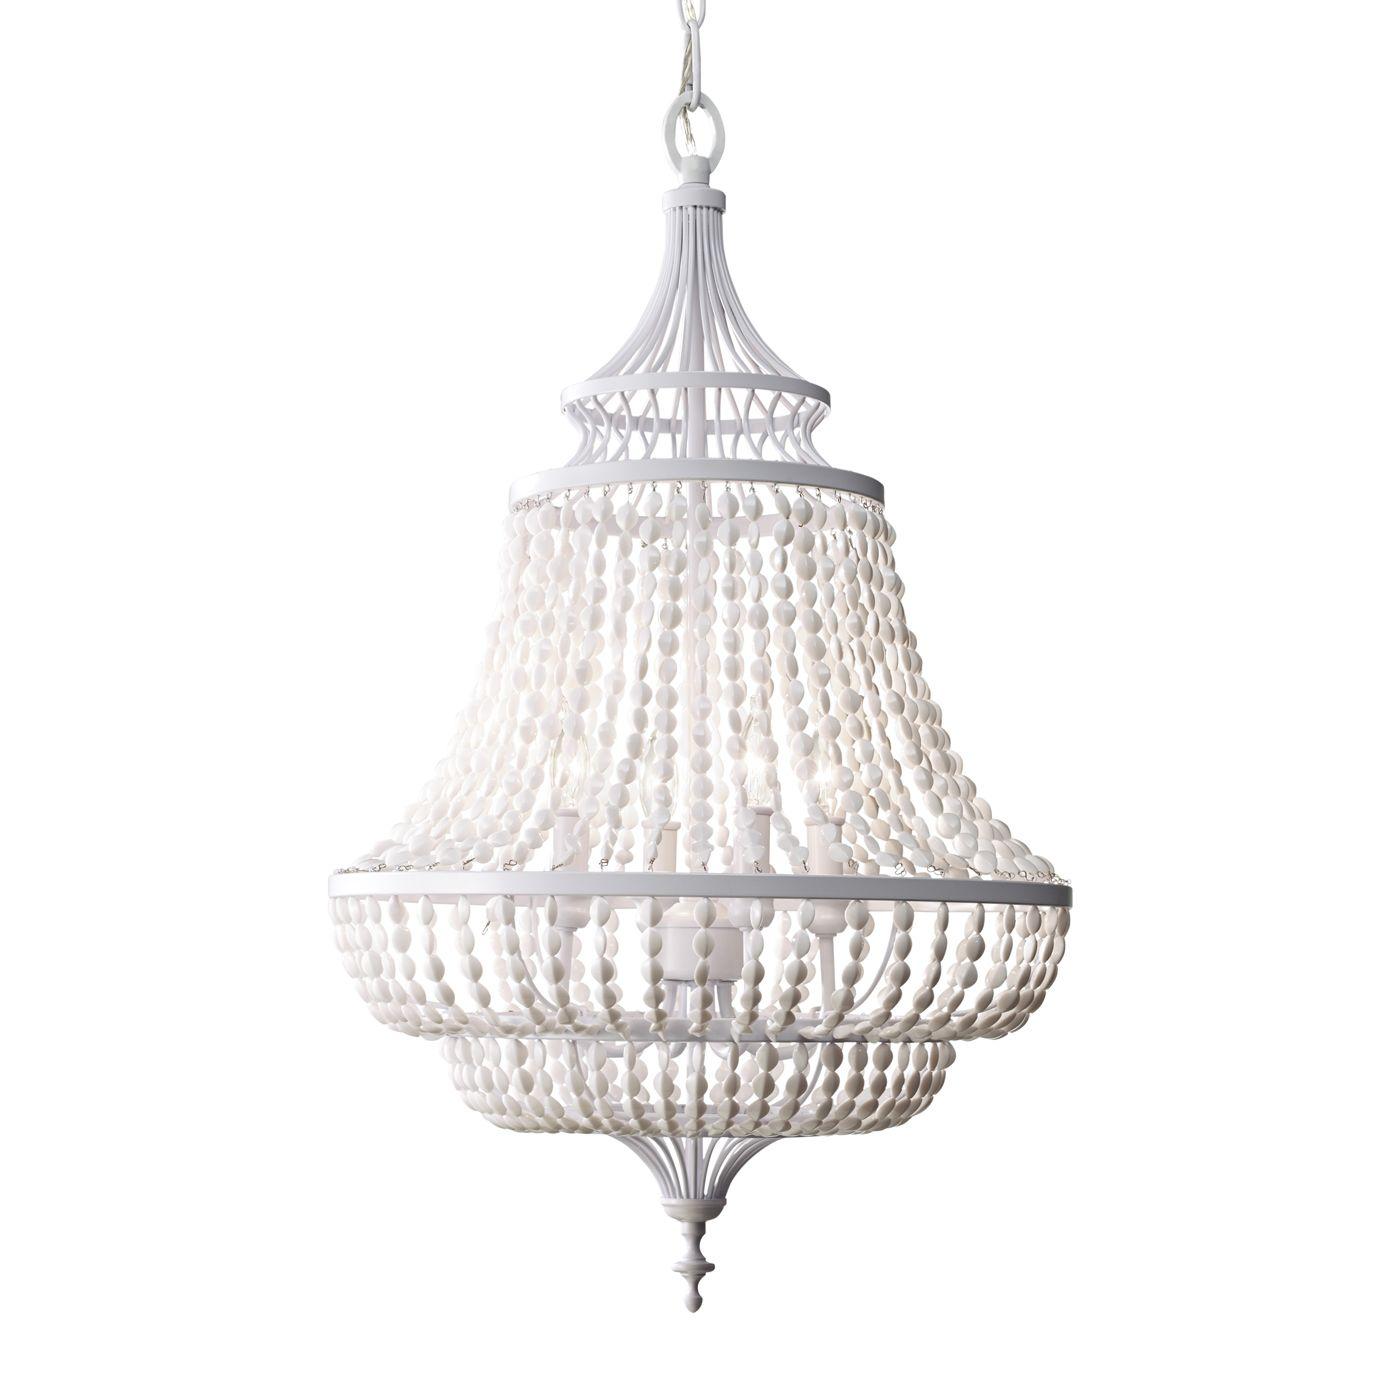 Shop feiss f28074wsg maarid 4 light single tier chandelier at atg feiss f28074wsg maarid 4 light single tier chandelier the mine arubaitofo Images